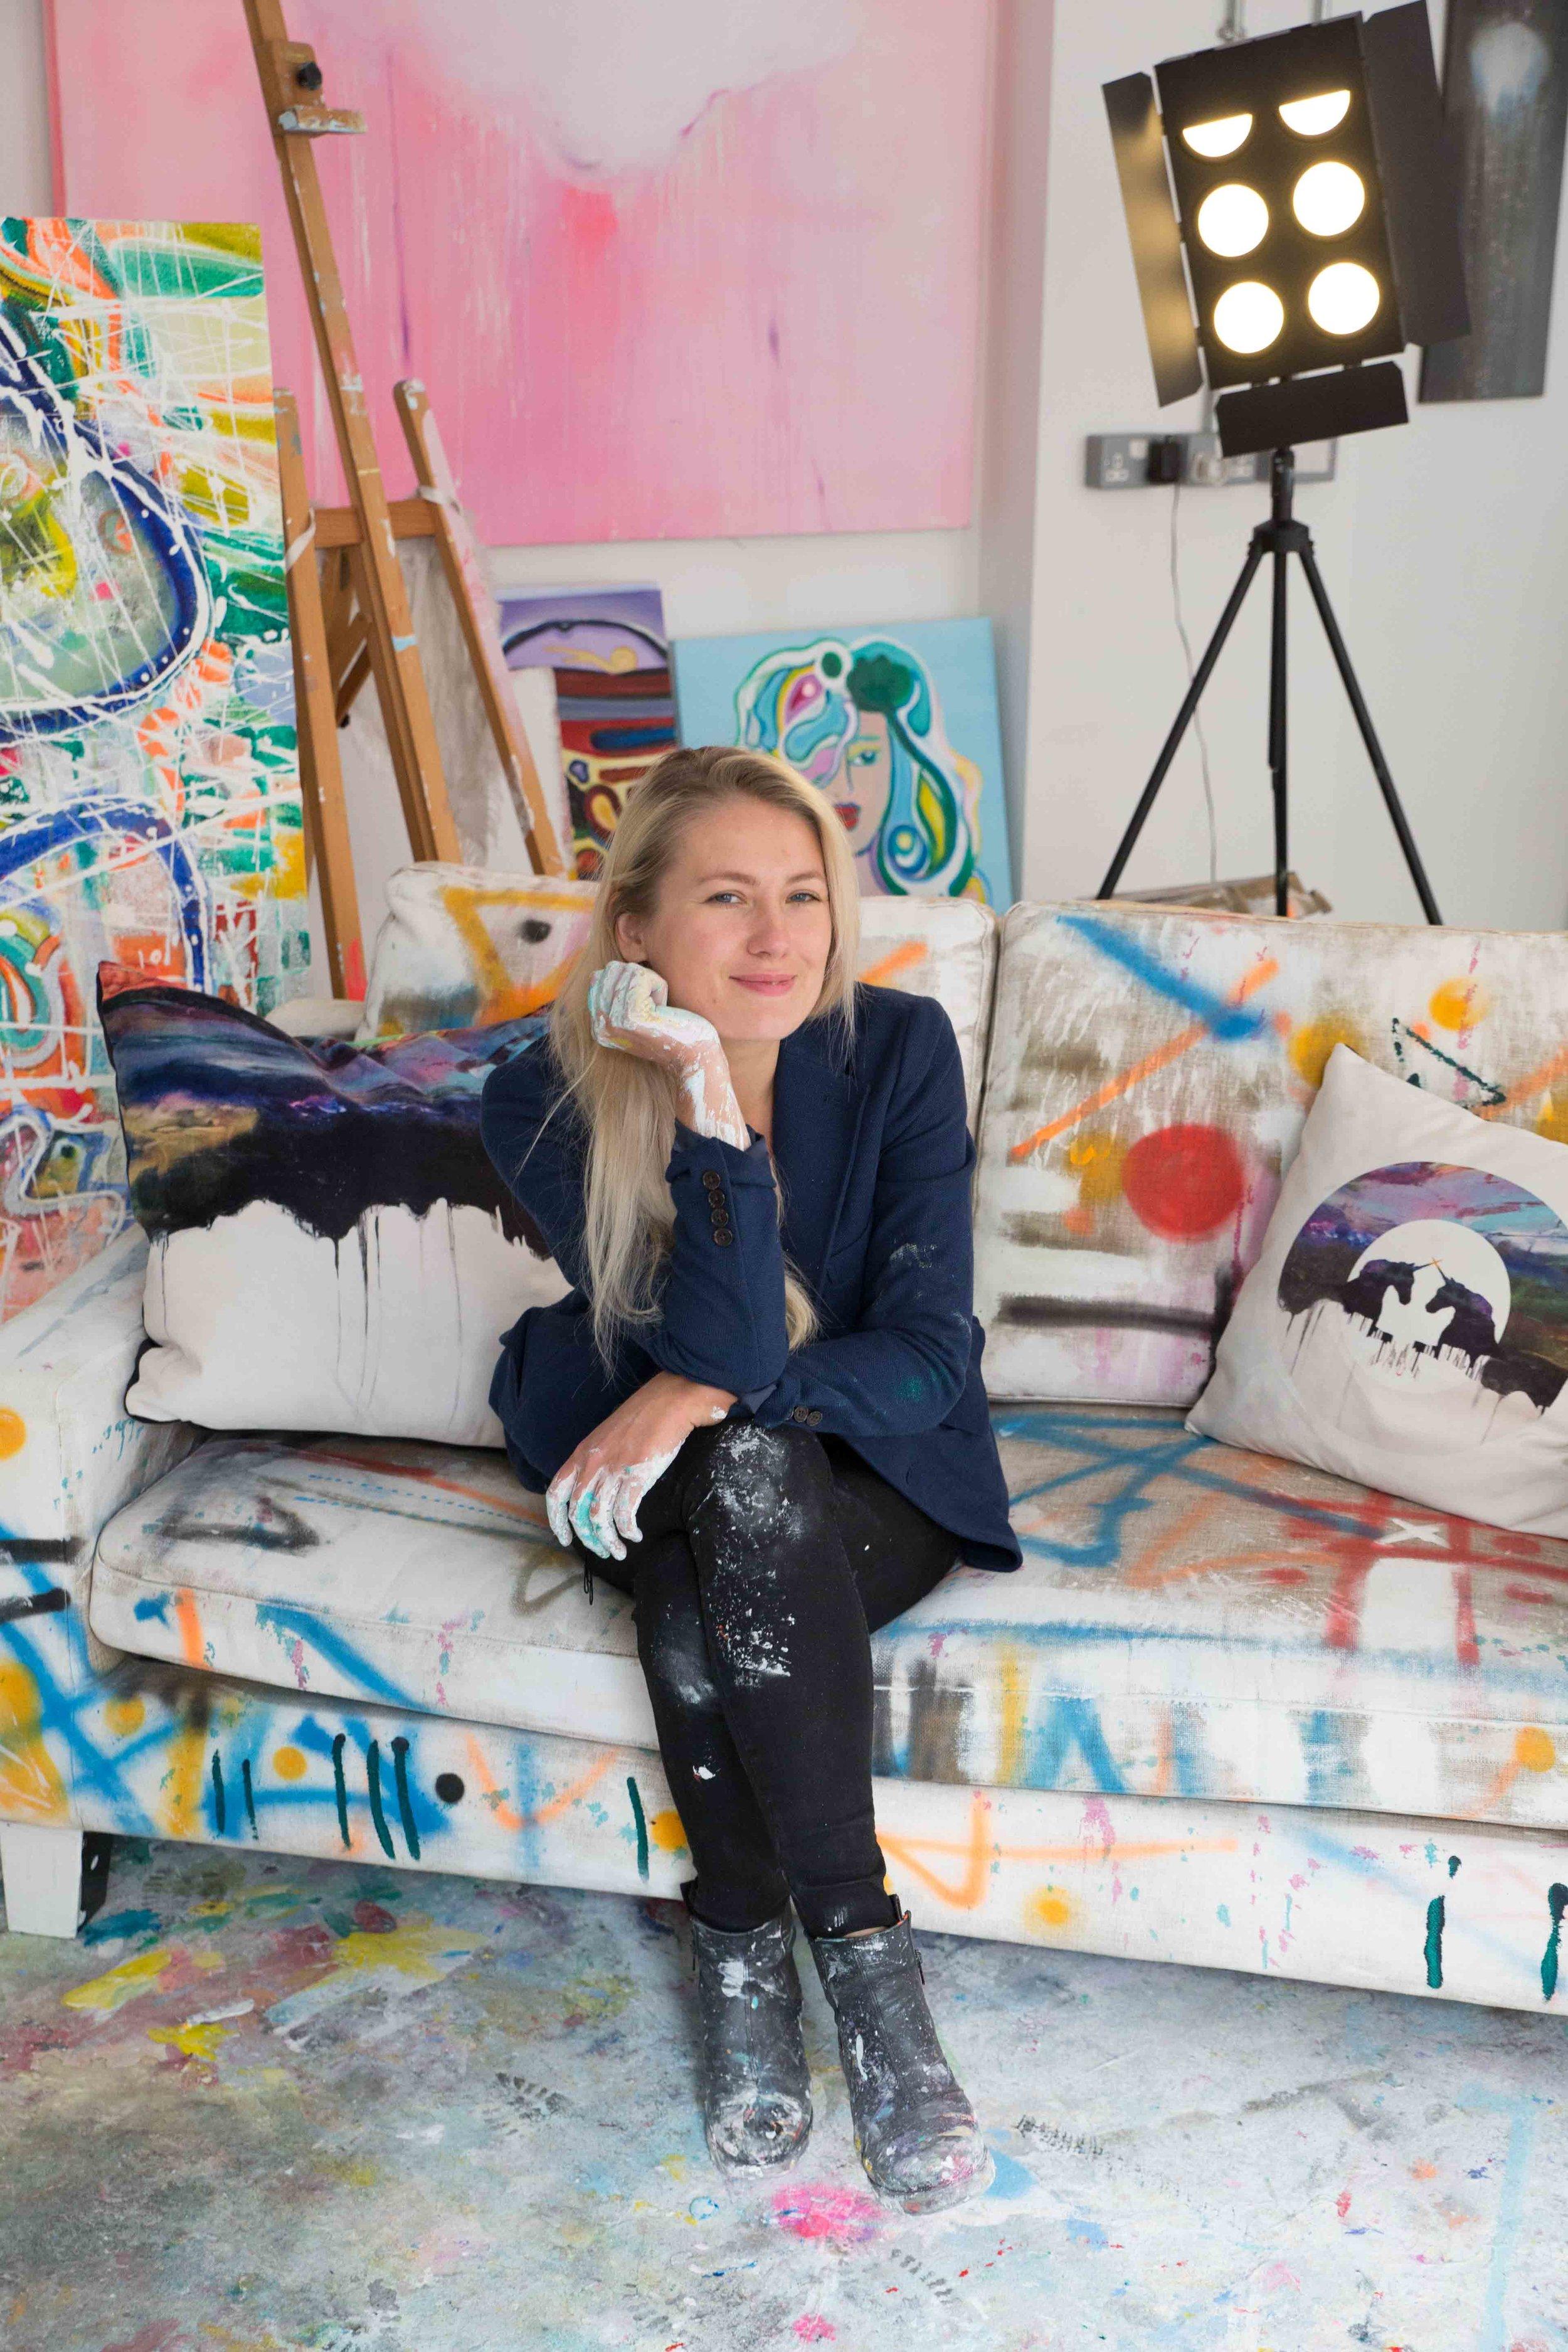 Meriliis MERU Rinne in her studio, London UK